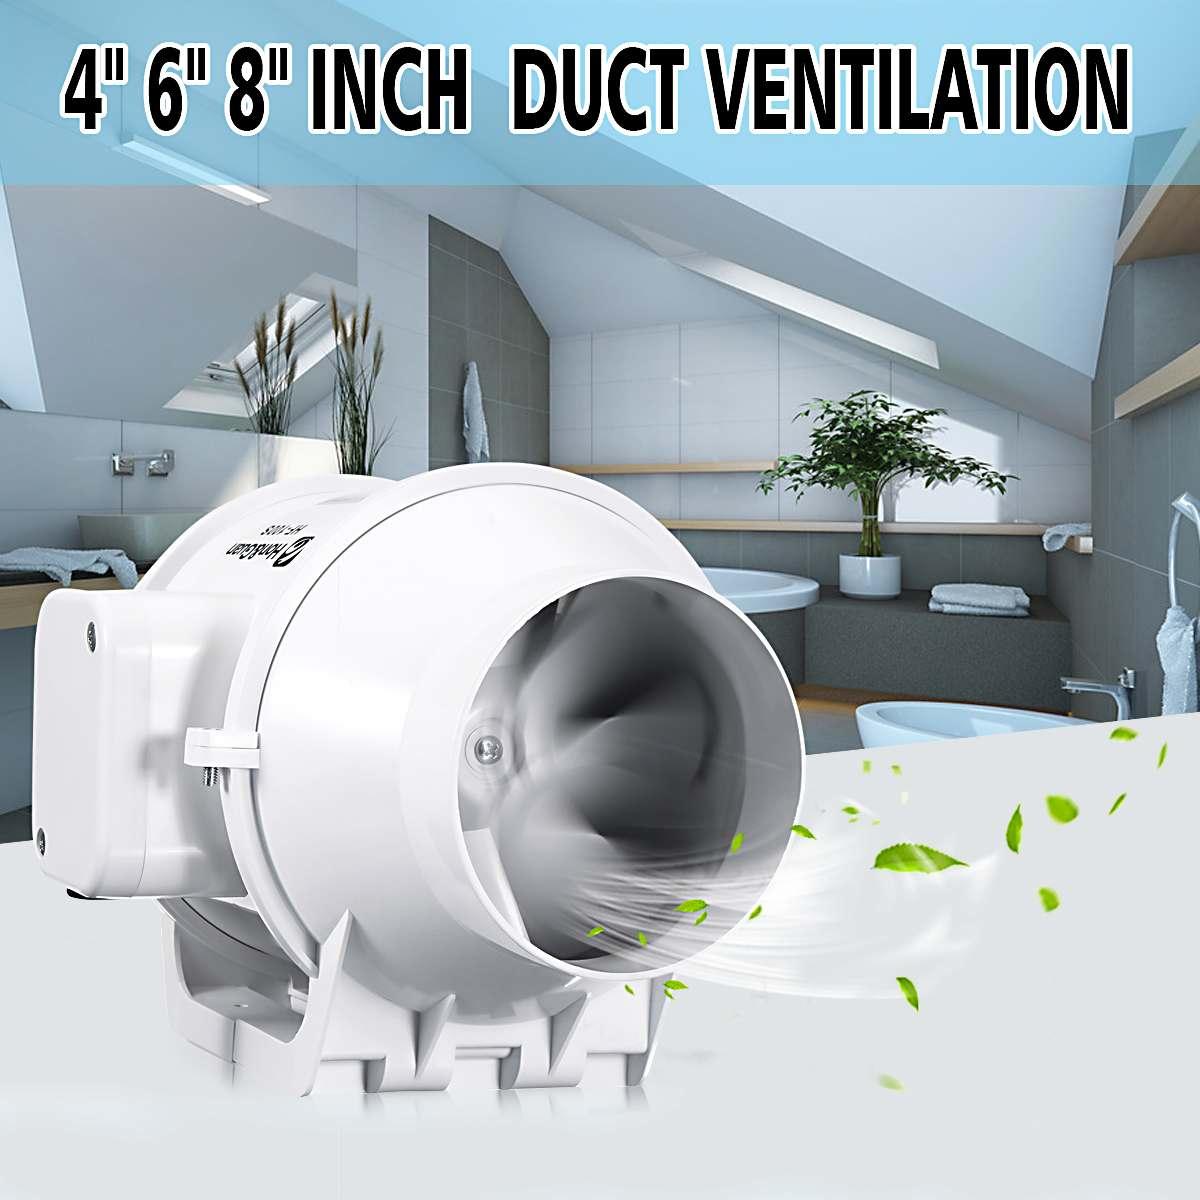 4'' 6'' 8'' Vent Inline Ventilation Tube Duct Fan Air Blower Speed Controller Pipe Exhaust Fan 220V Booster Turbo Fan 100mm